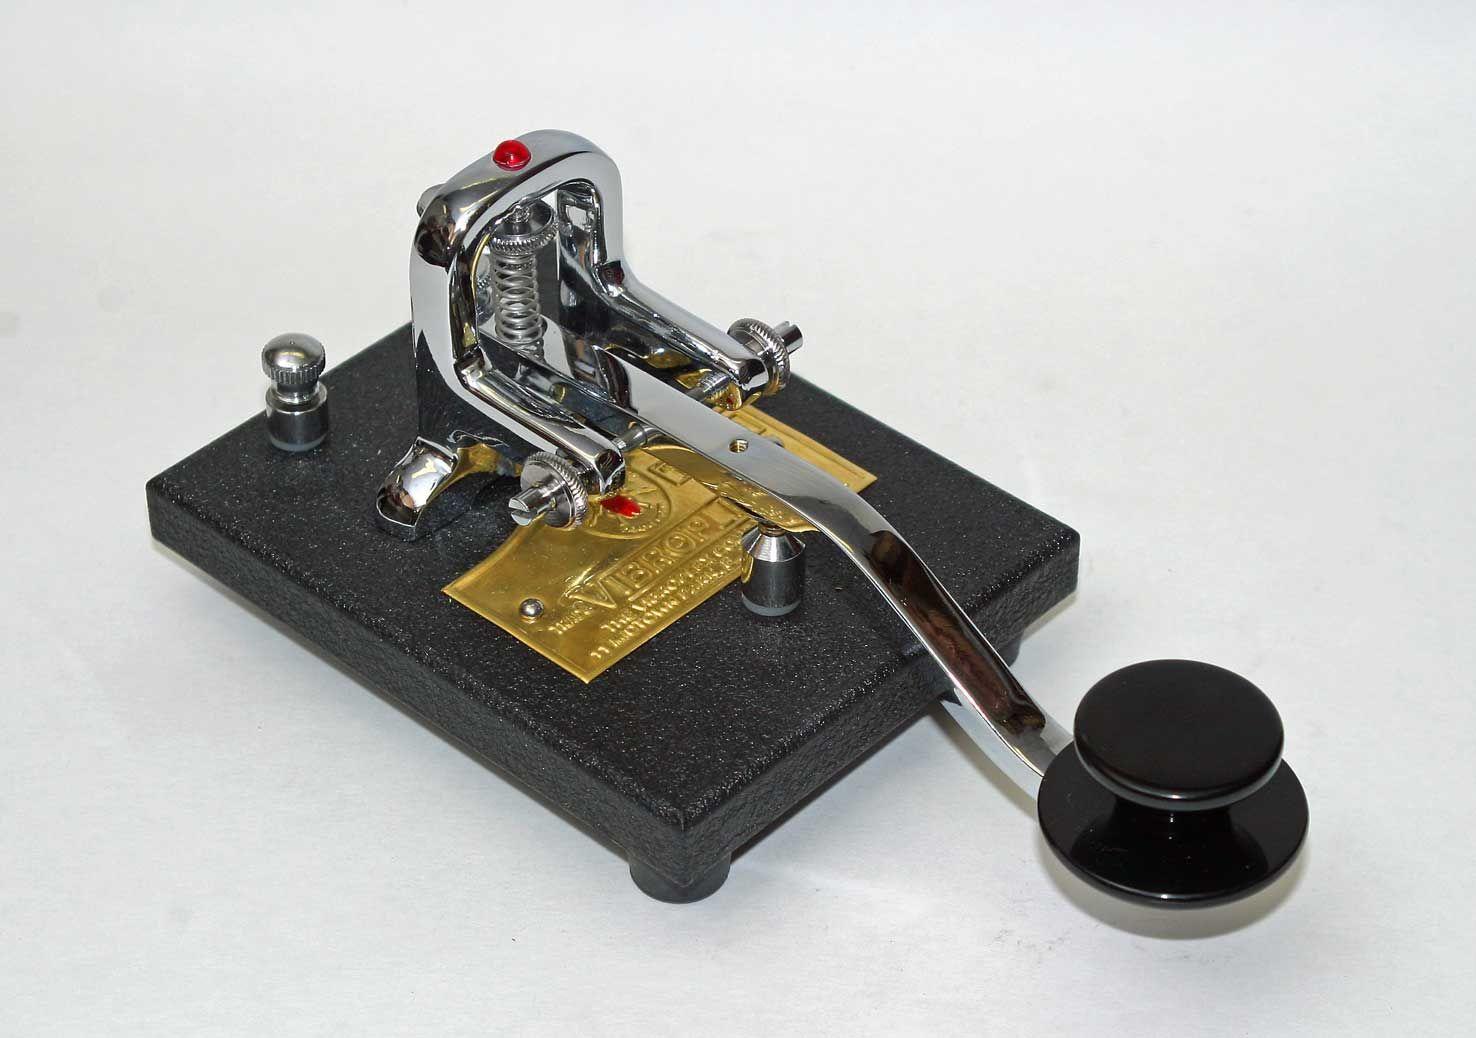 Vibroplex Key Deluxe | CW Keys | Morse code, Ham radio, Key